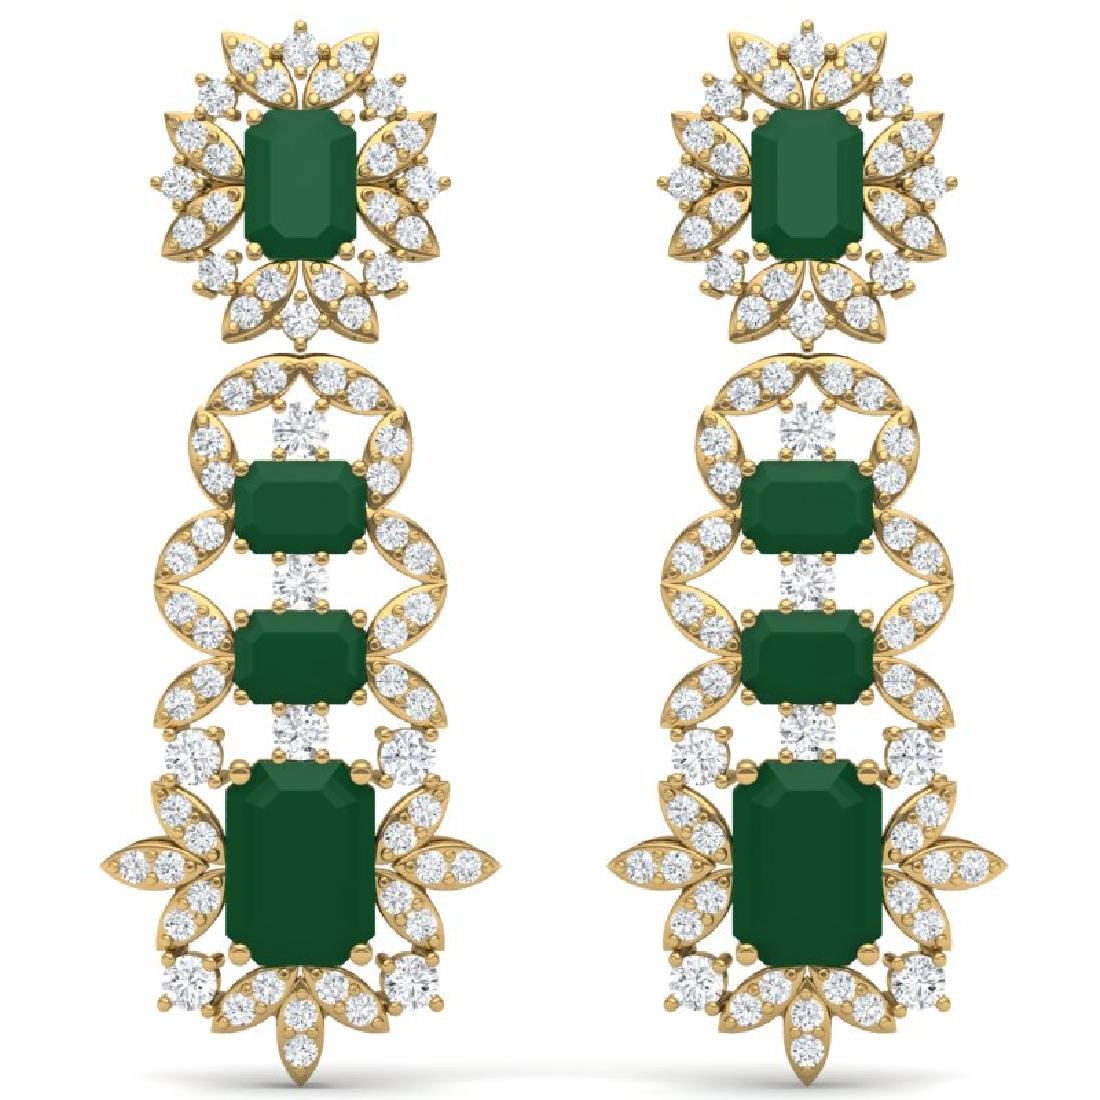 30.25 CTW Royalty Emerald & VS Diamond Earrings 18K